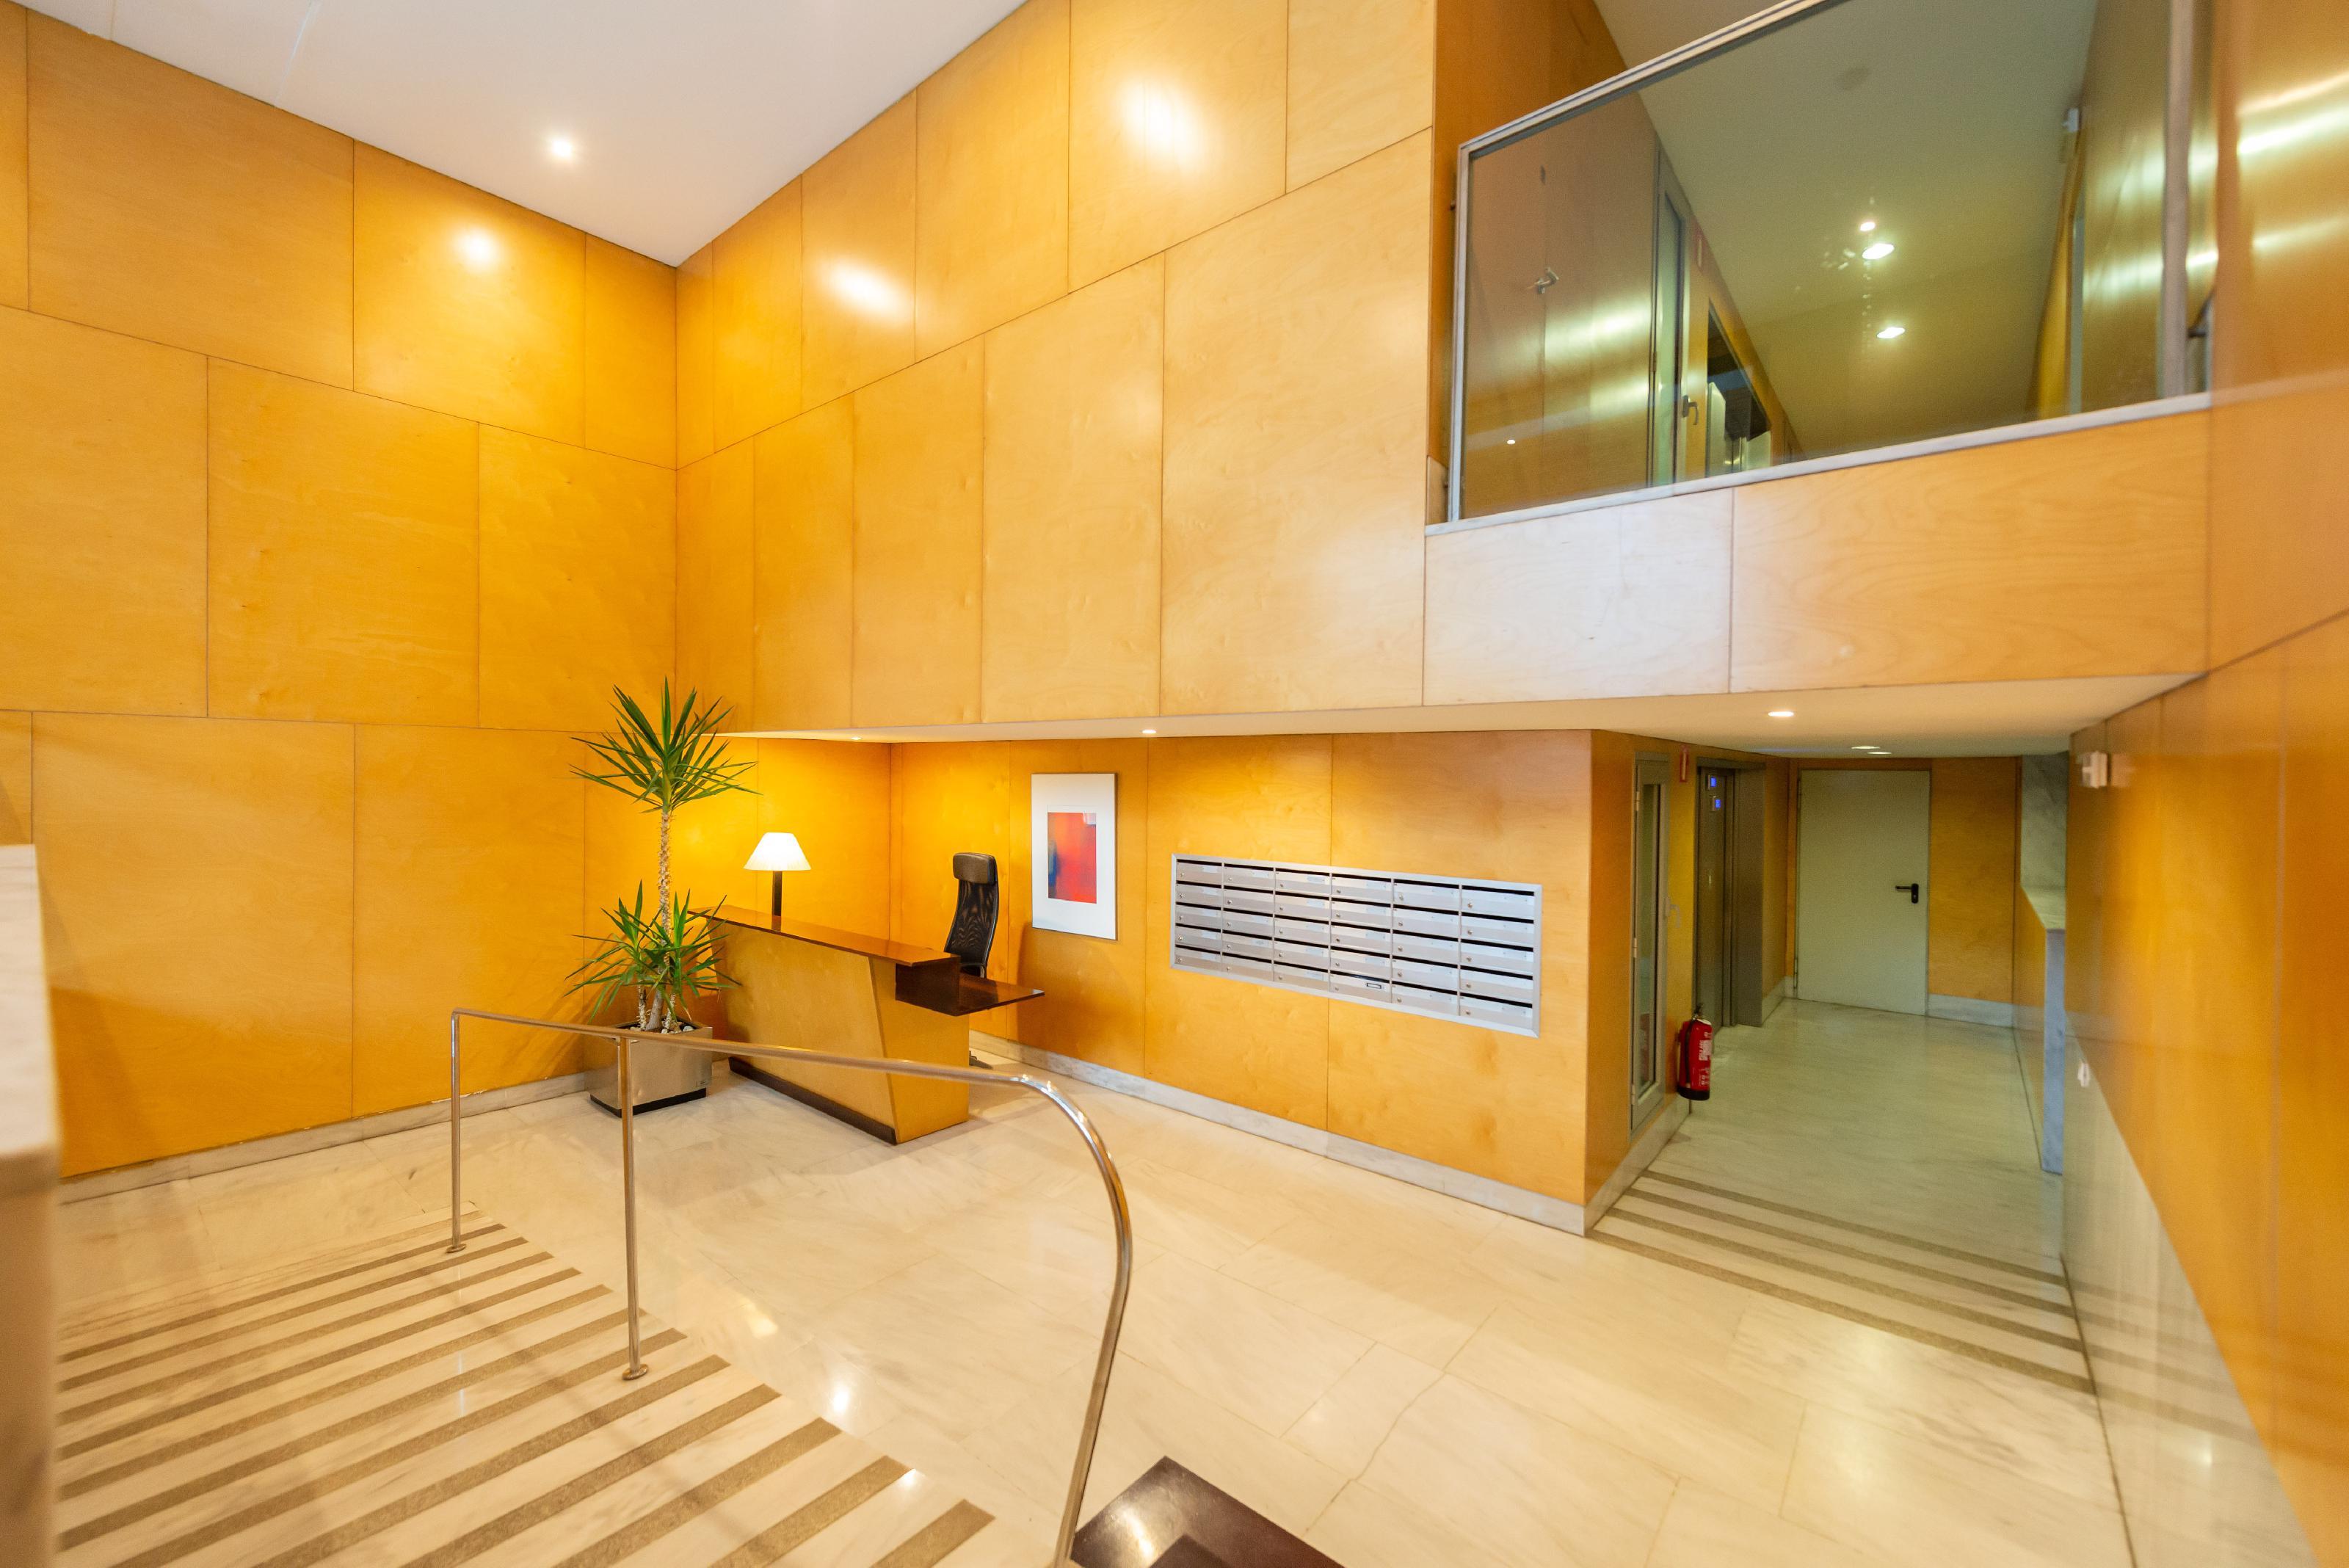 246281 Flat for sale in Sarrià-Sant Gervasi, Tres Torres 20